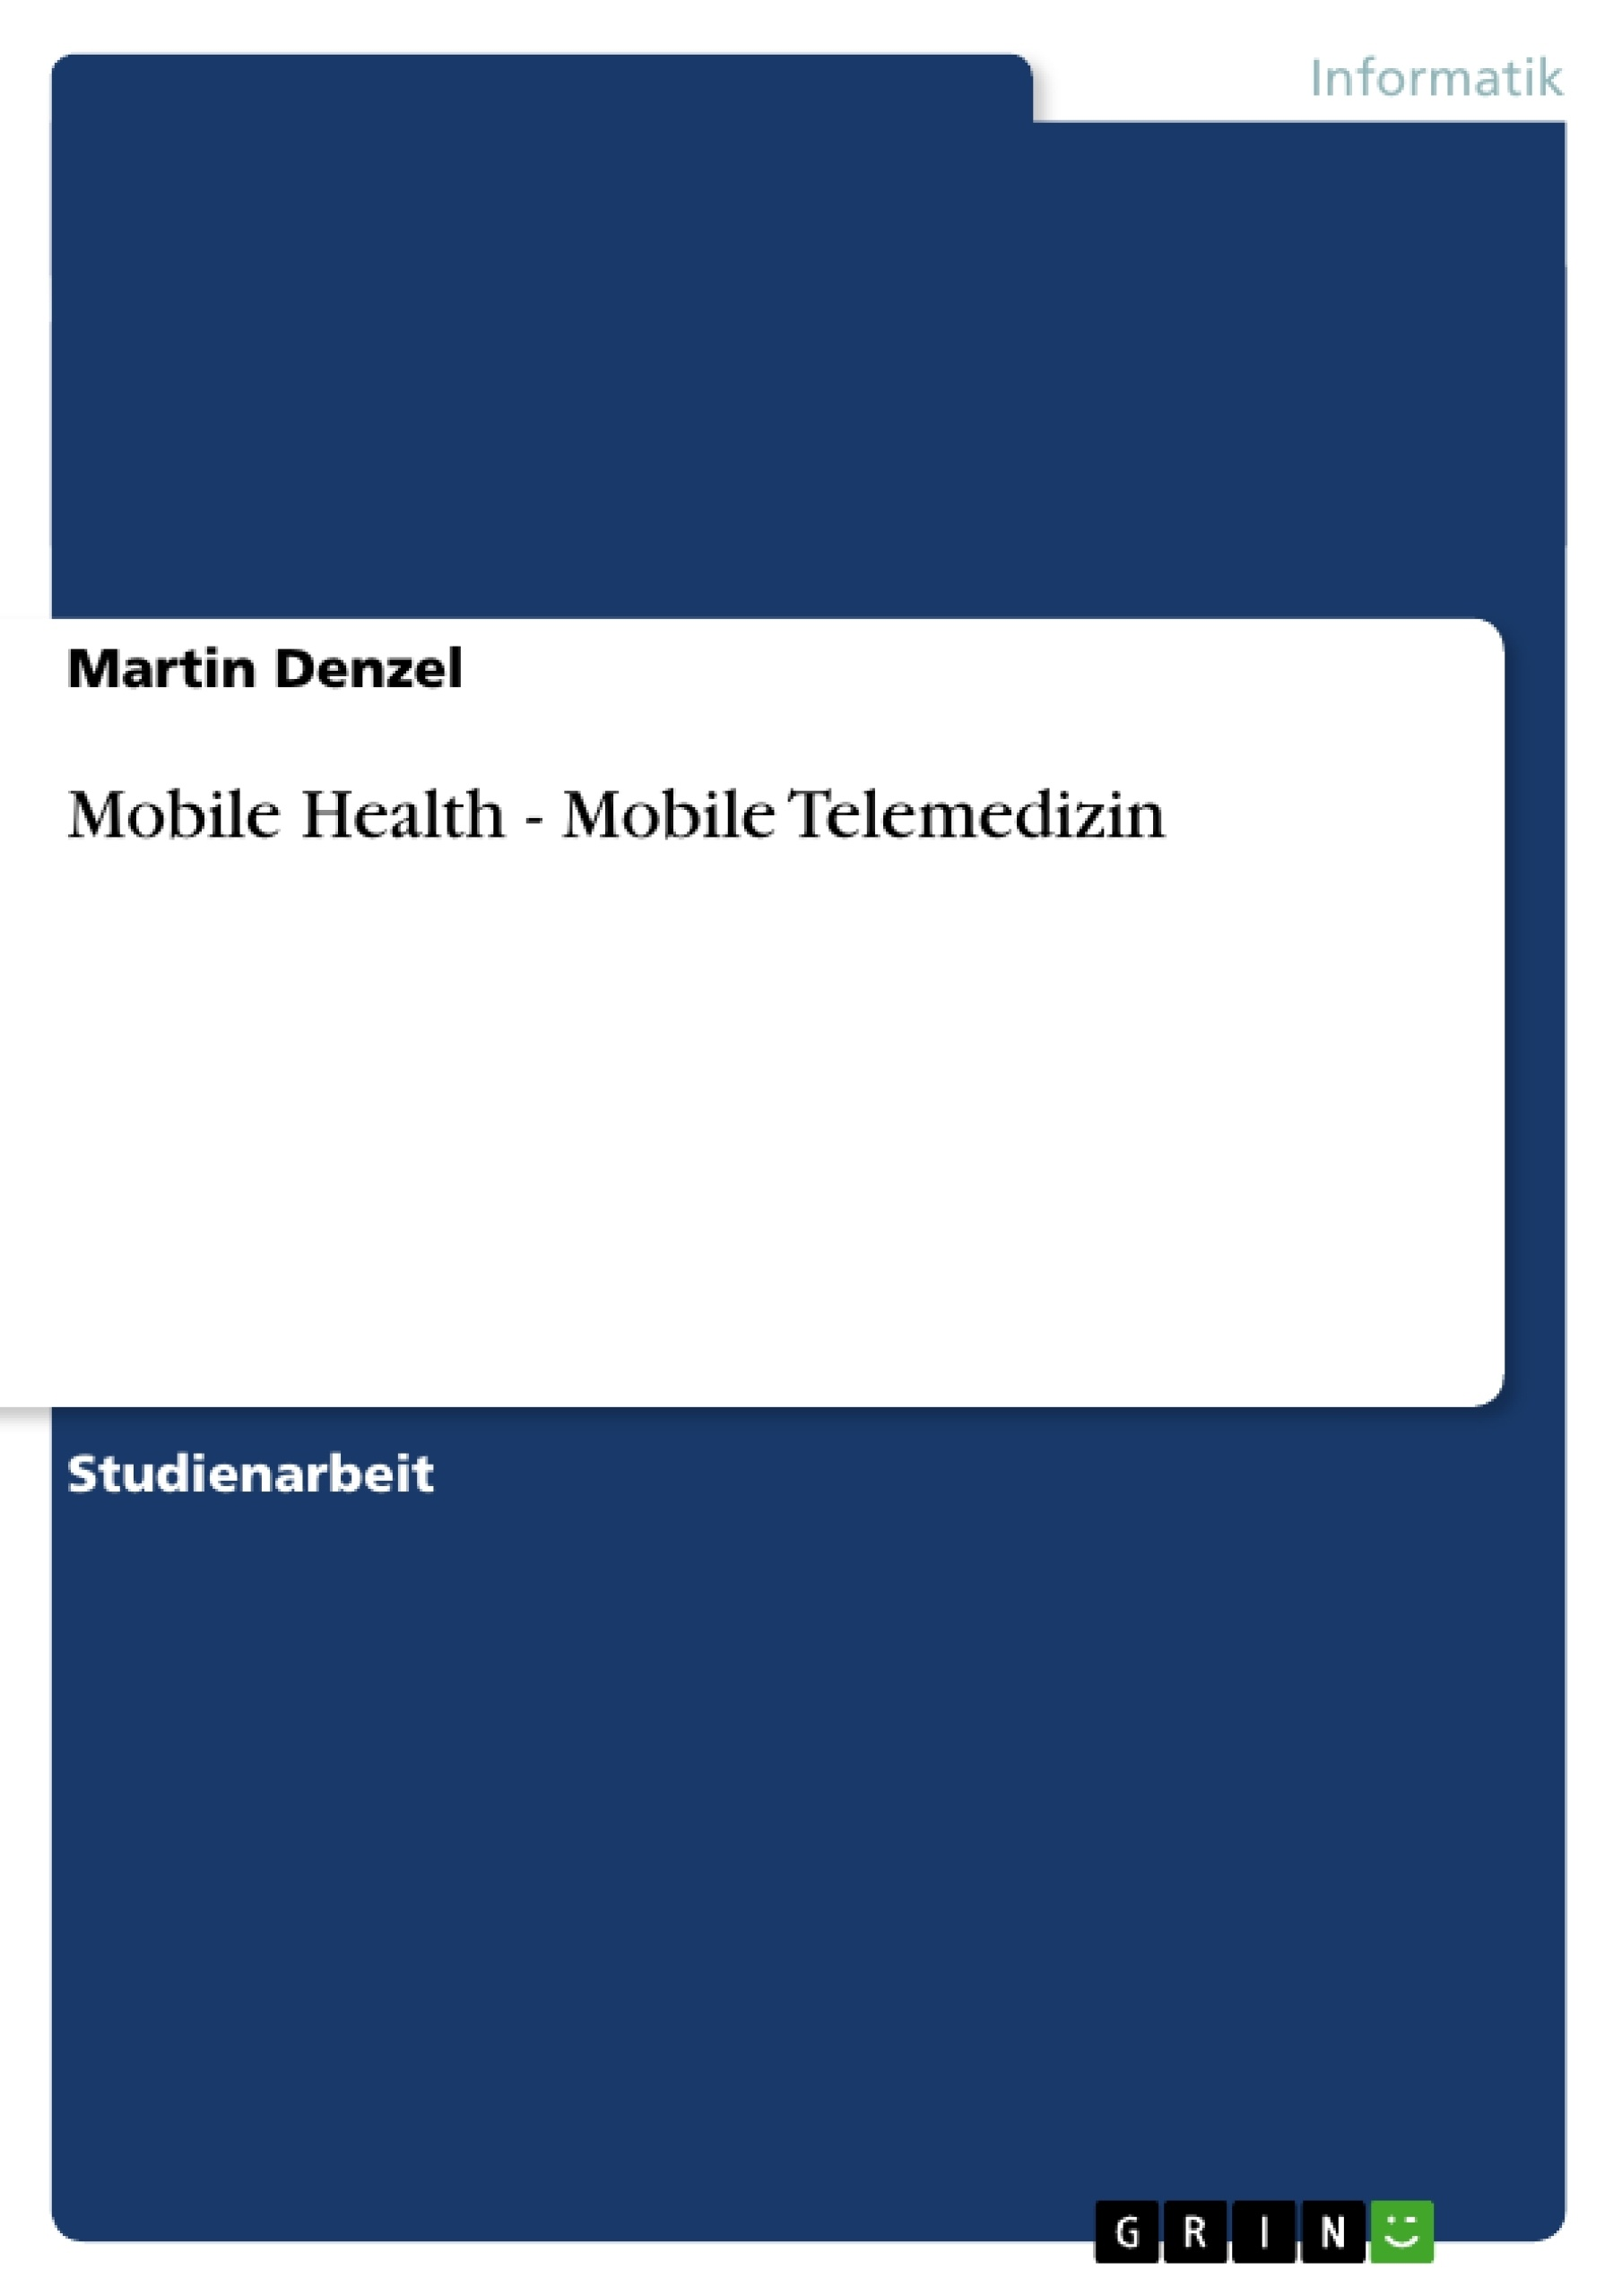 Titel: Mobile Health - Mobile Telemedizin